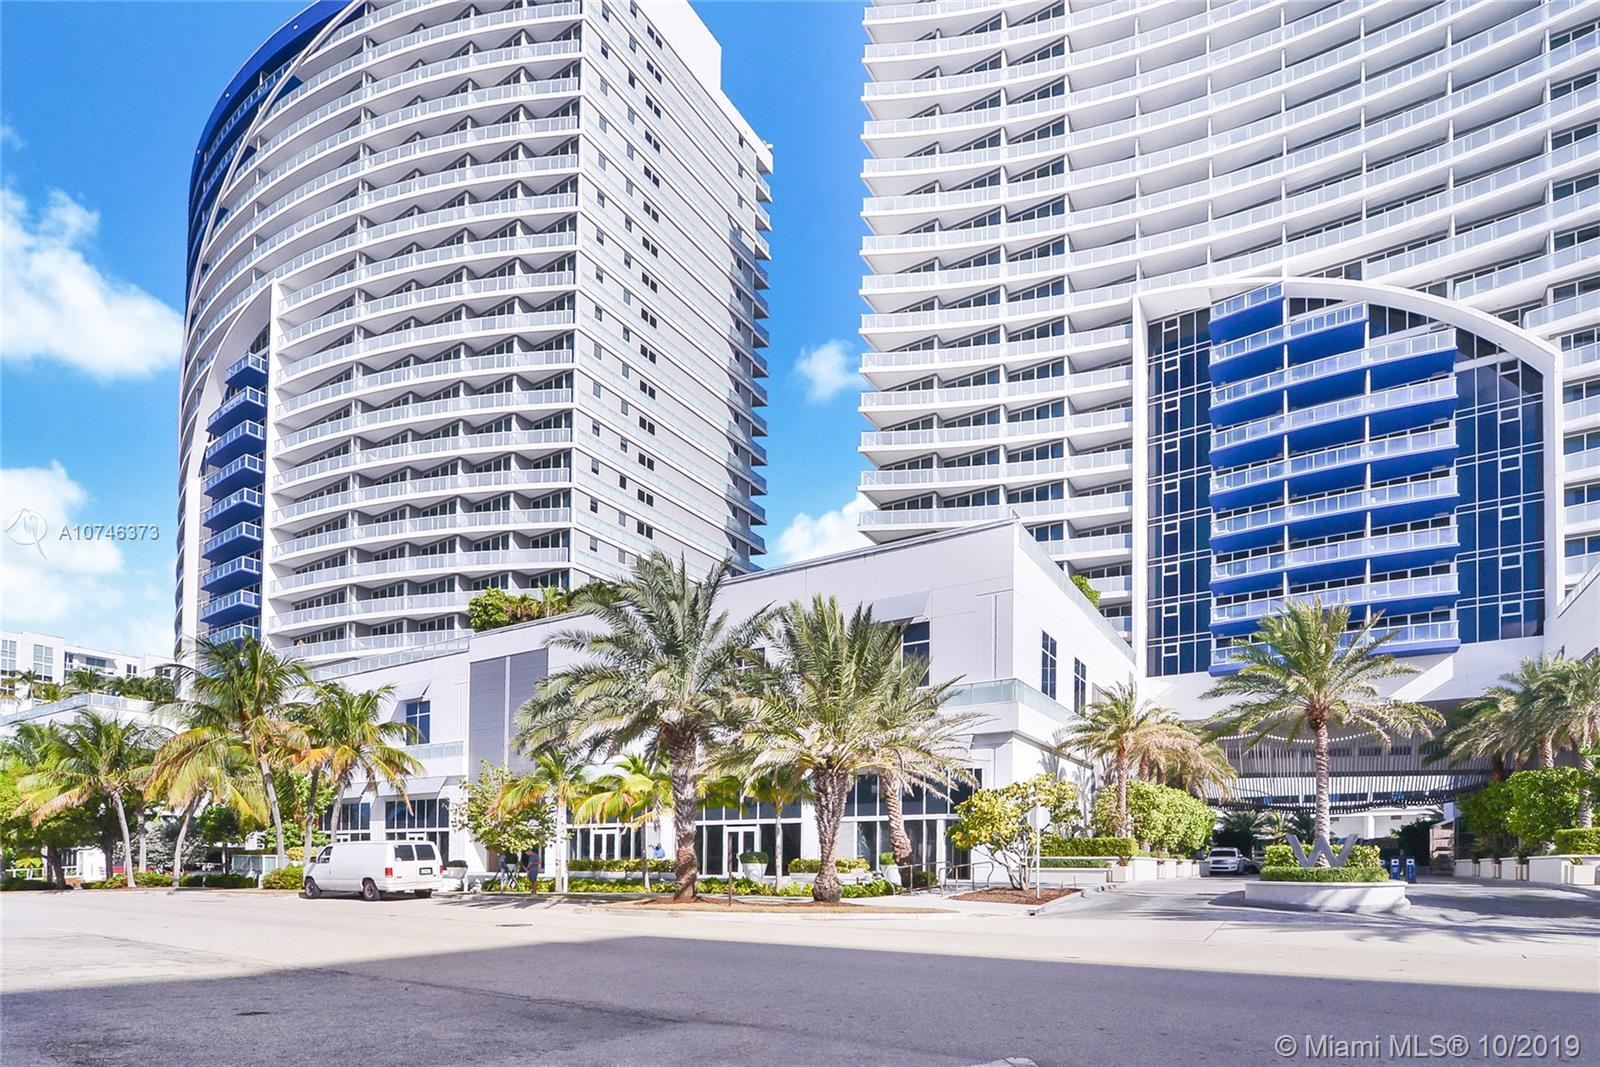 3101 Bayshore Dr, 2209 - Fort Lauderdale, Florida